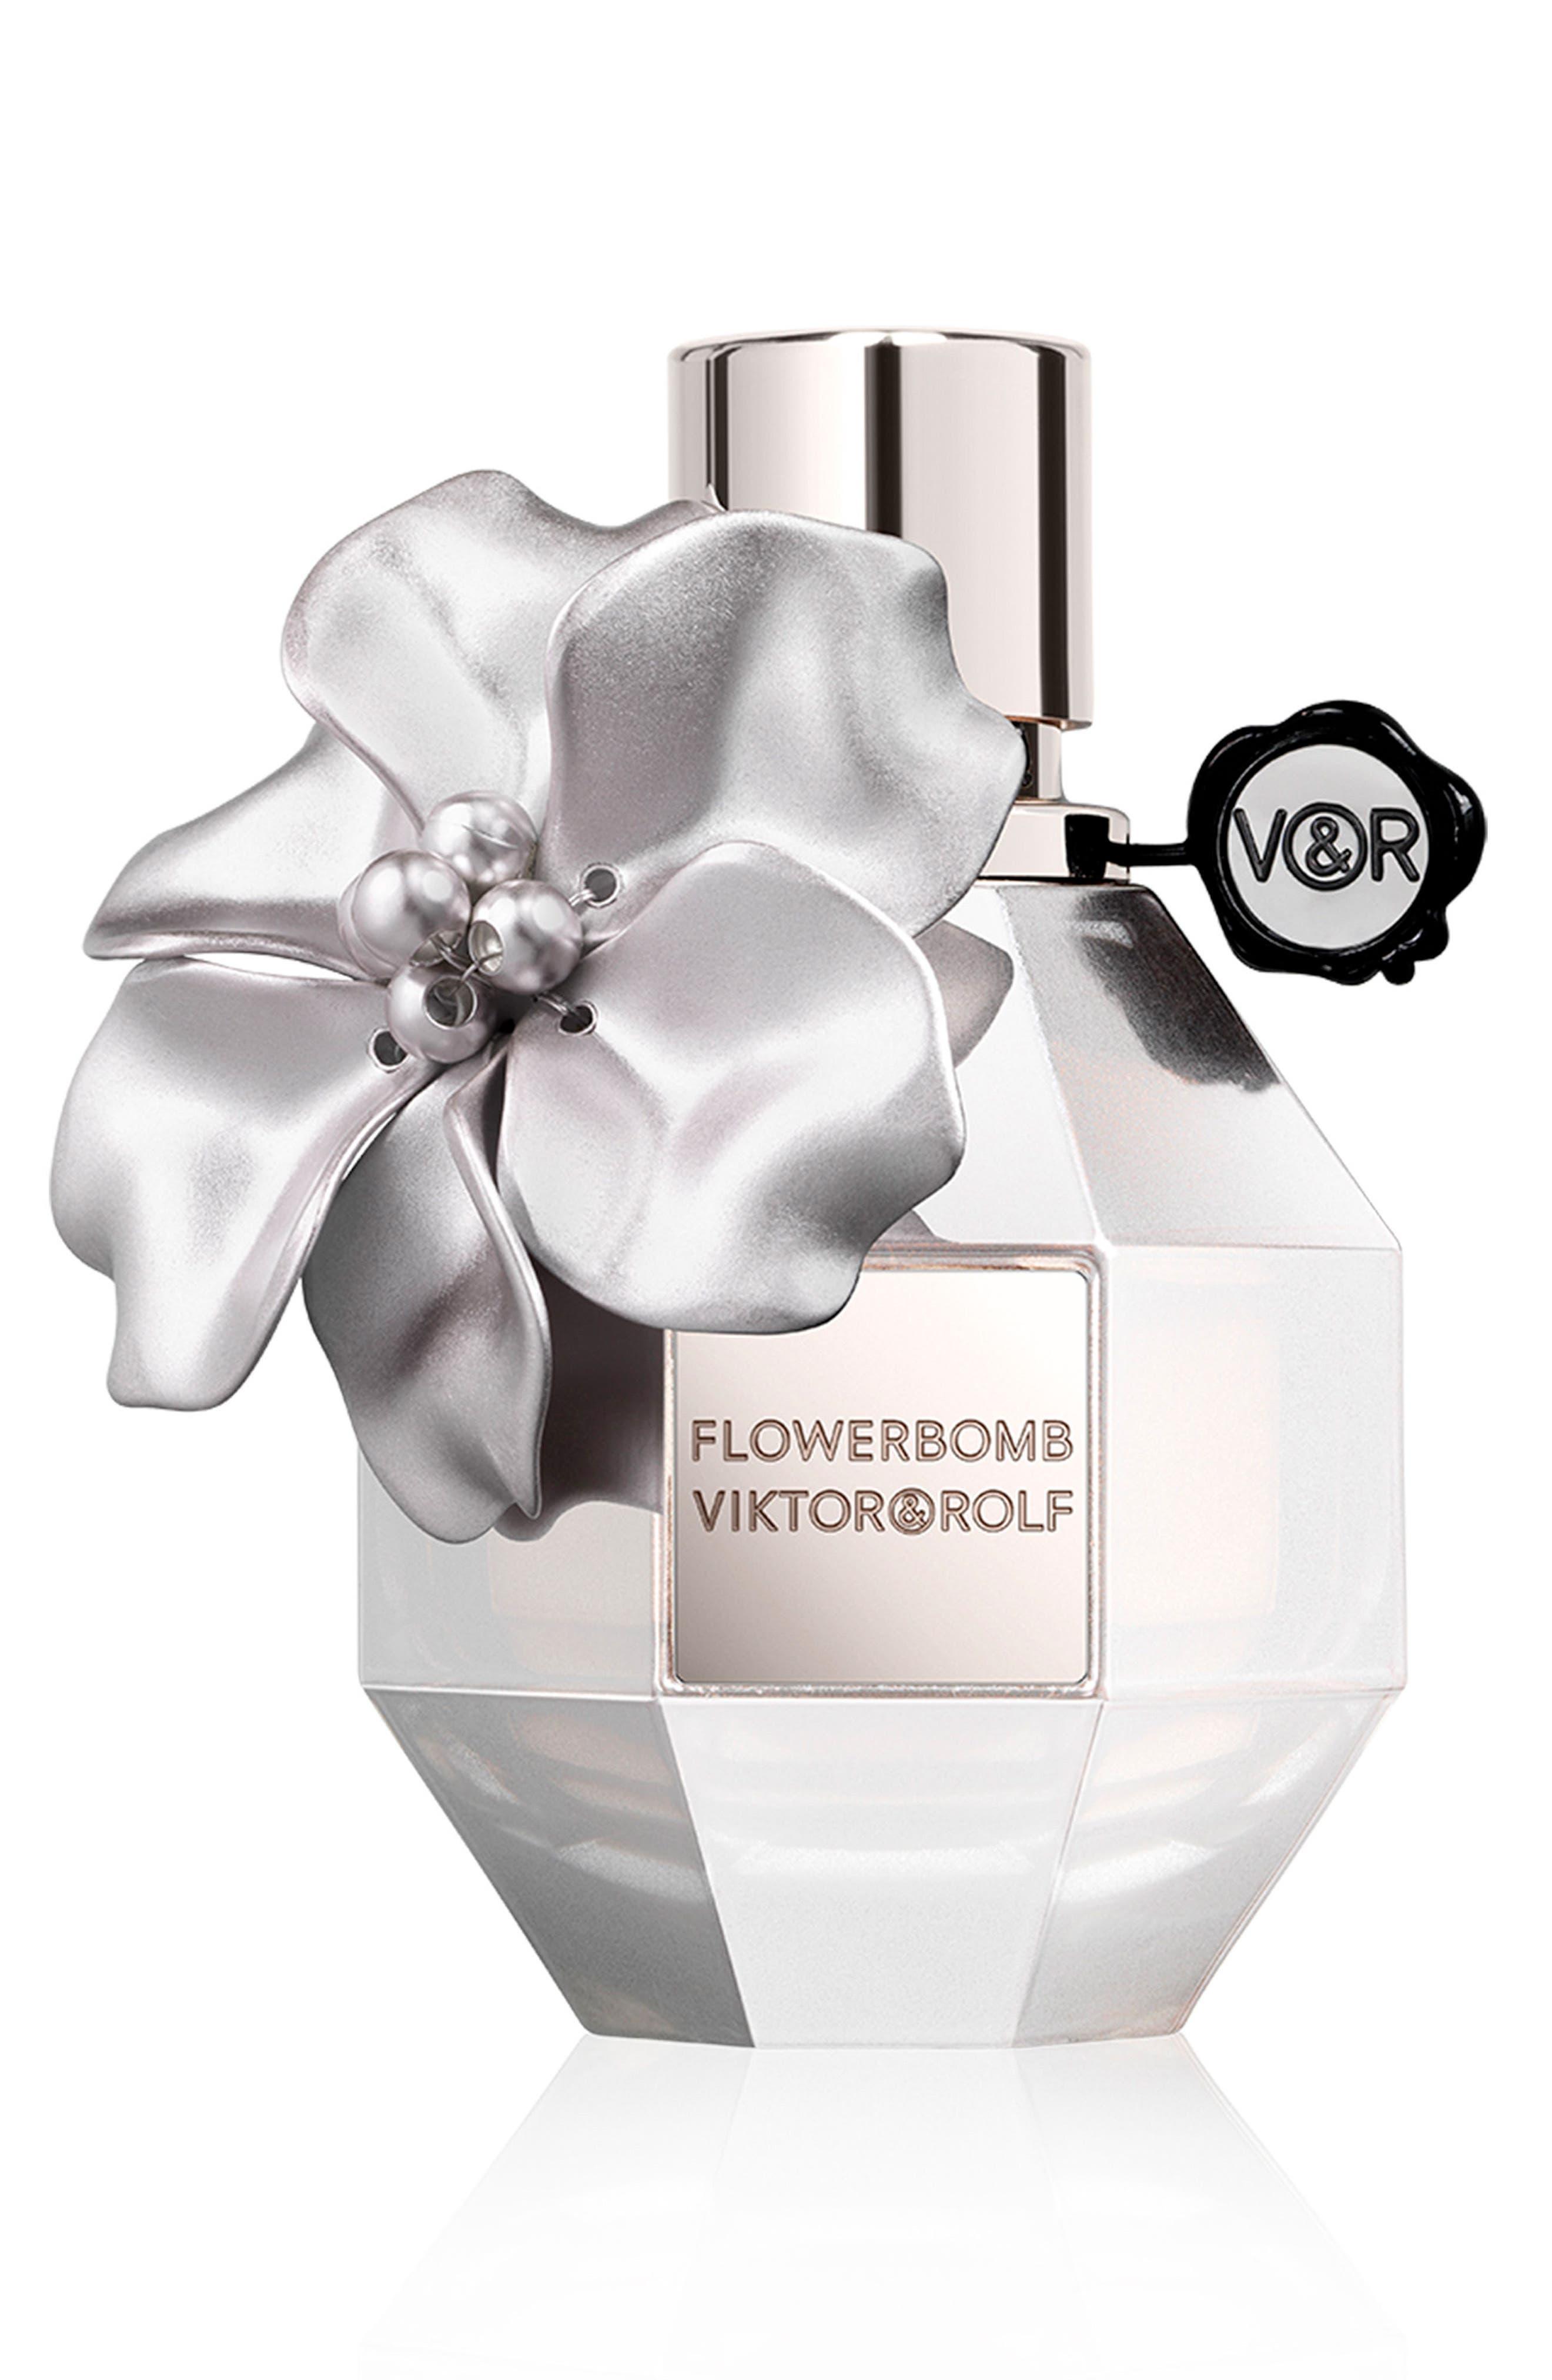 Viktor&Rolf Flowerbomb Silver Eau de Parfum (Nordstrom Exclusive)